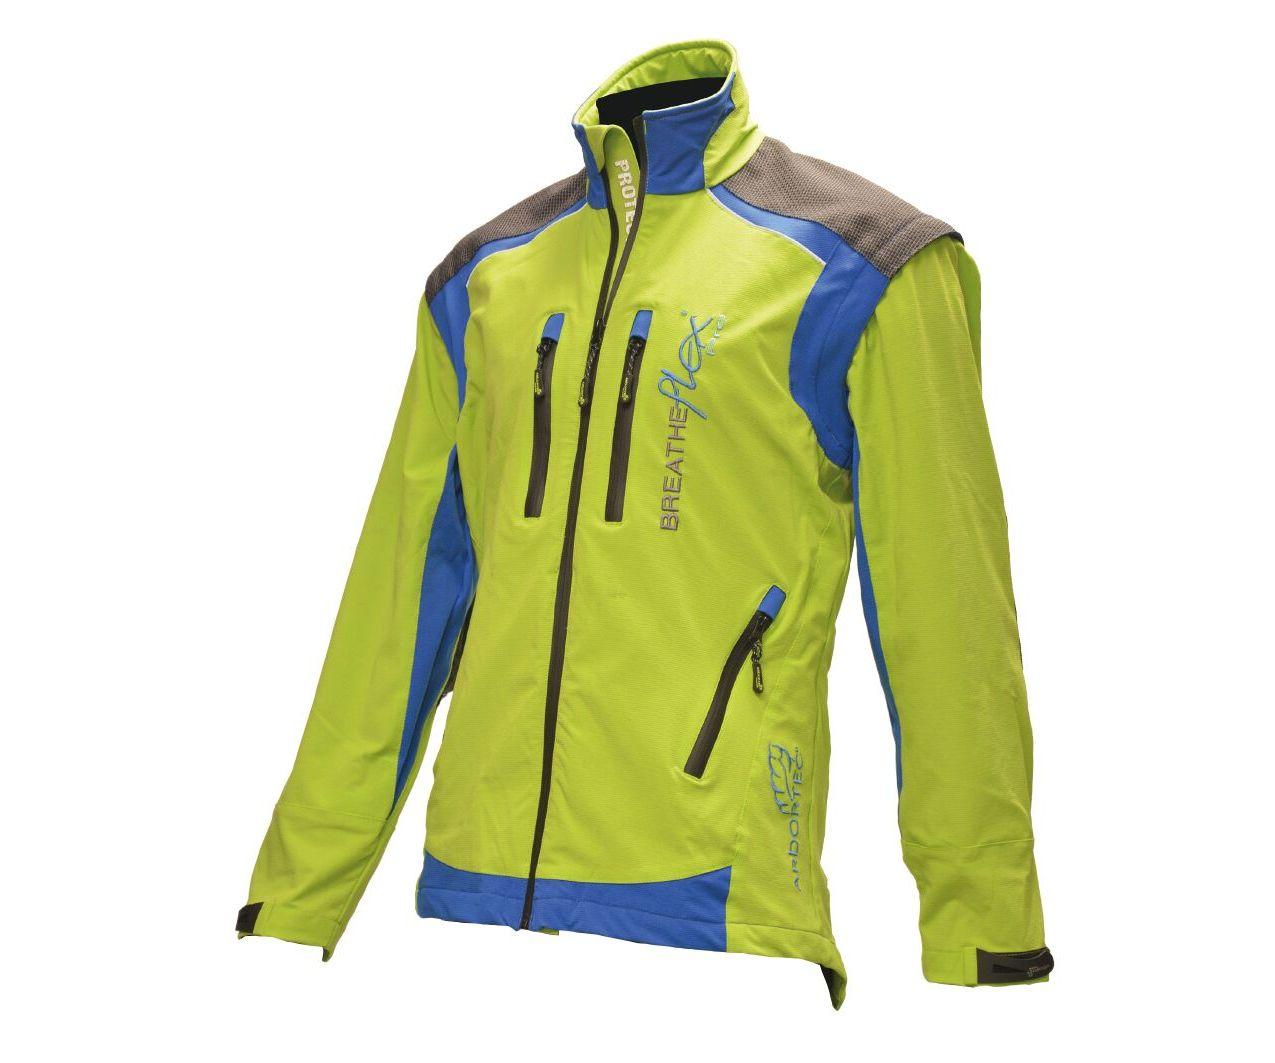 Arbortec Breatheflex Pro performance work jacket (Lime)